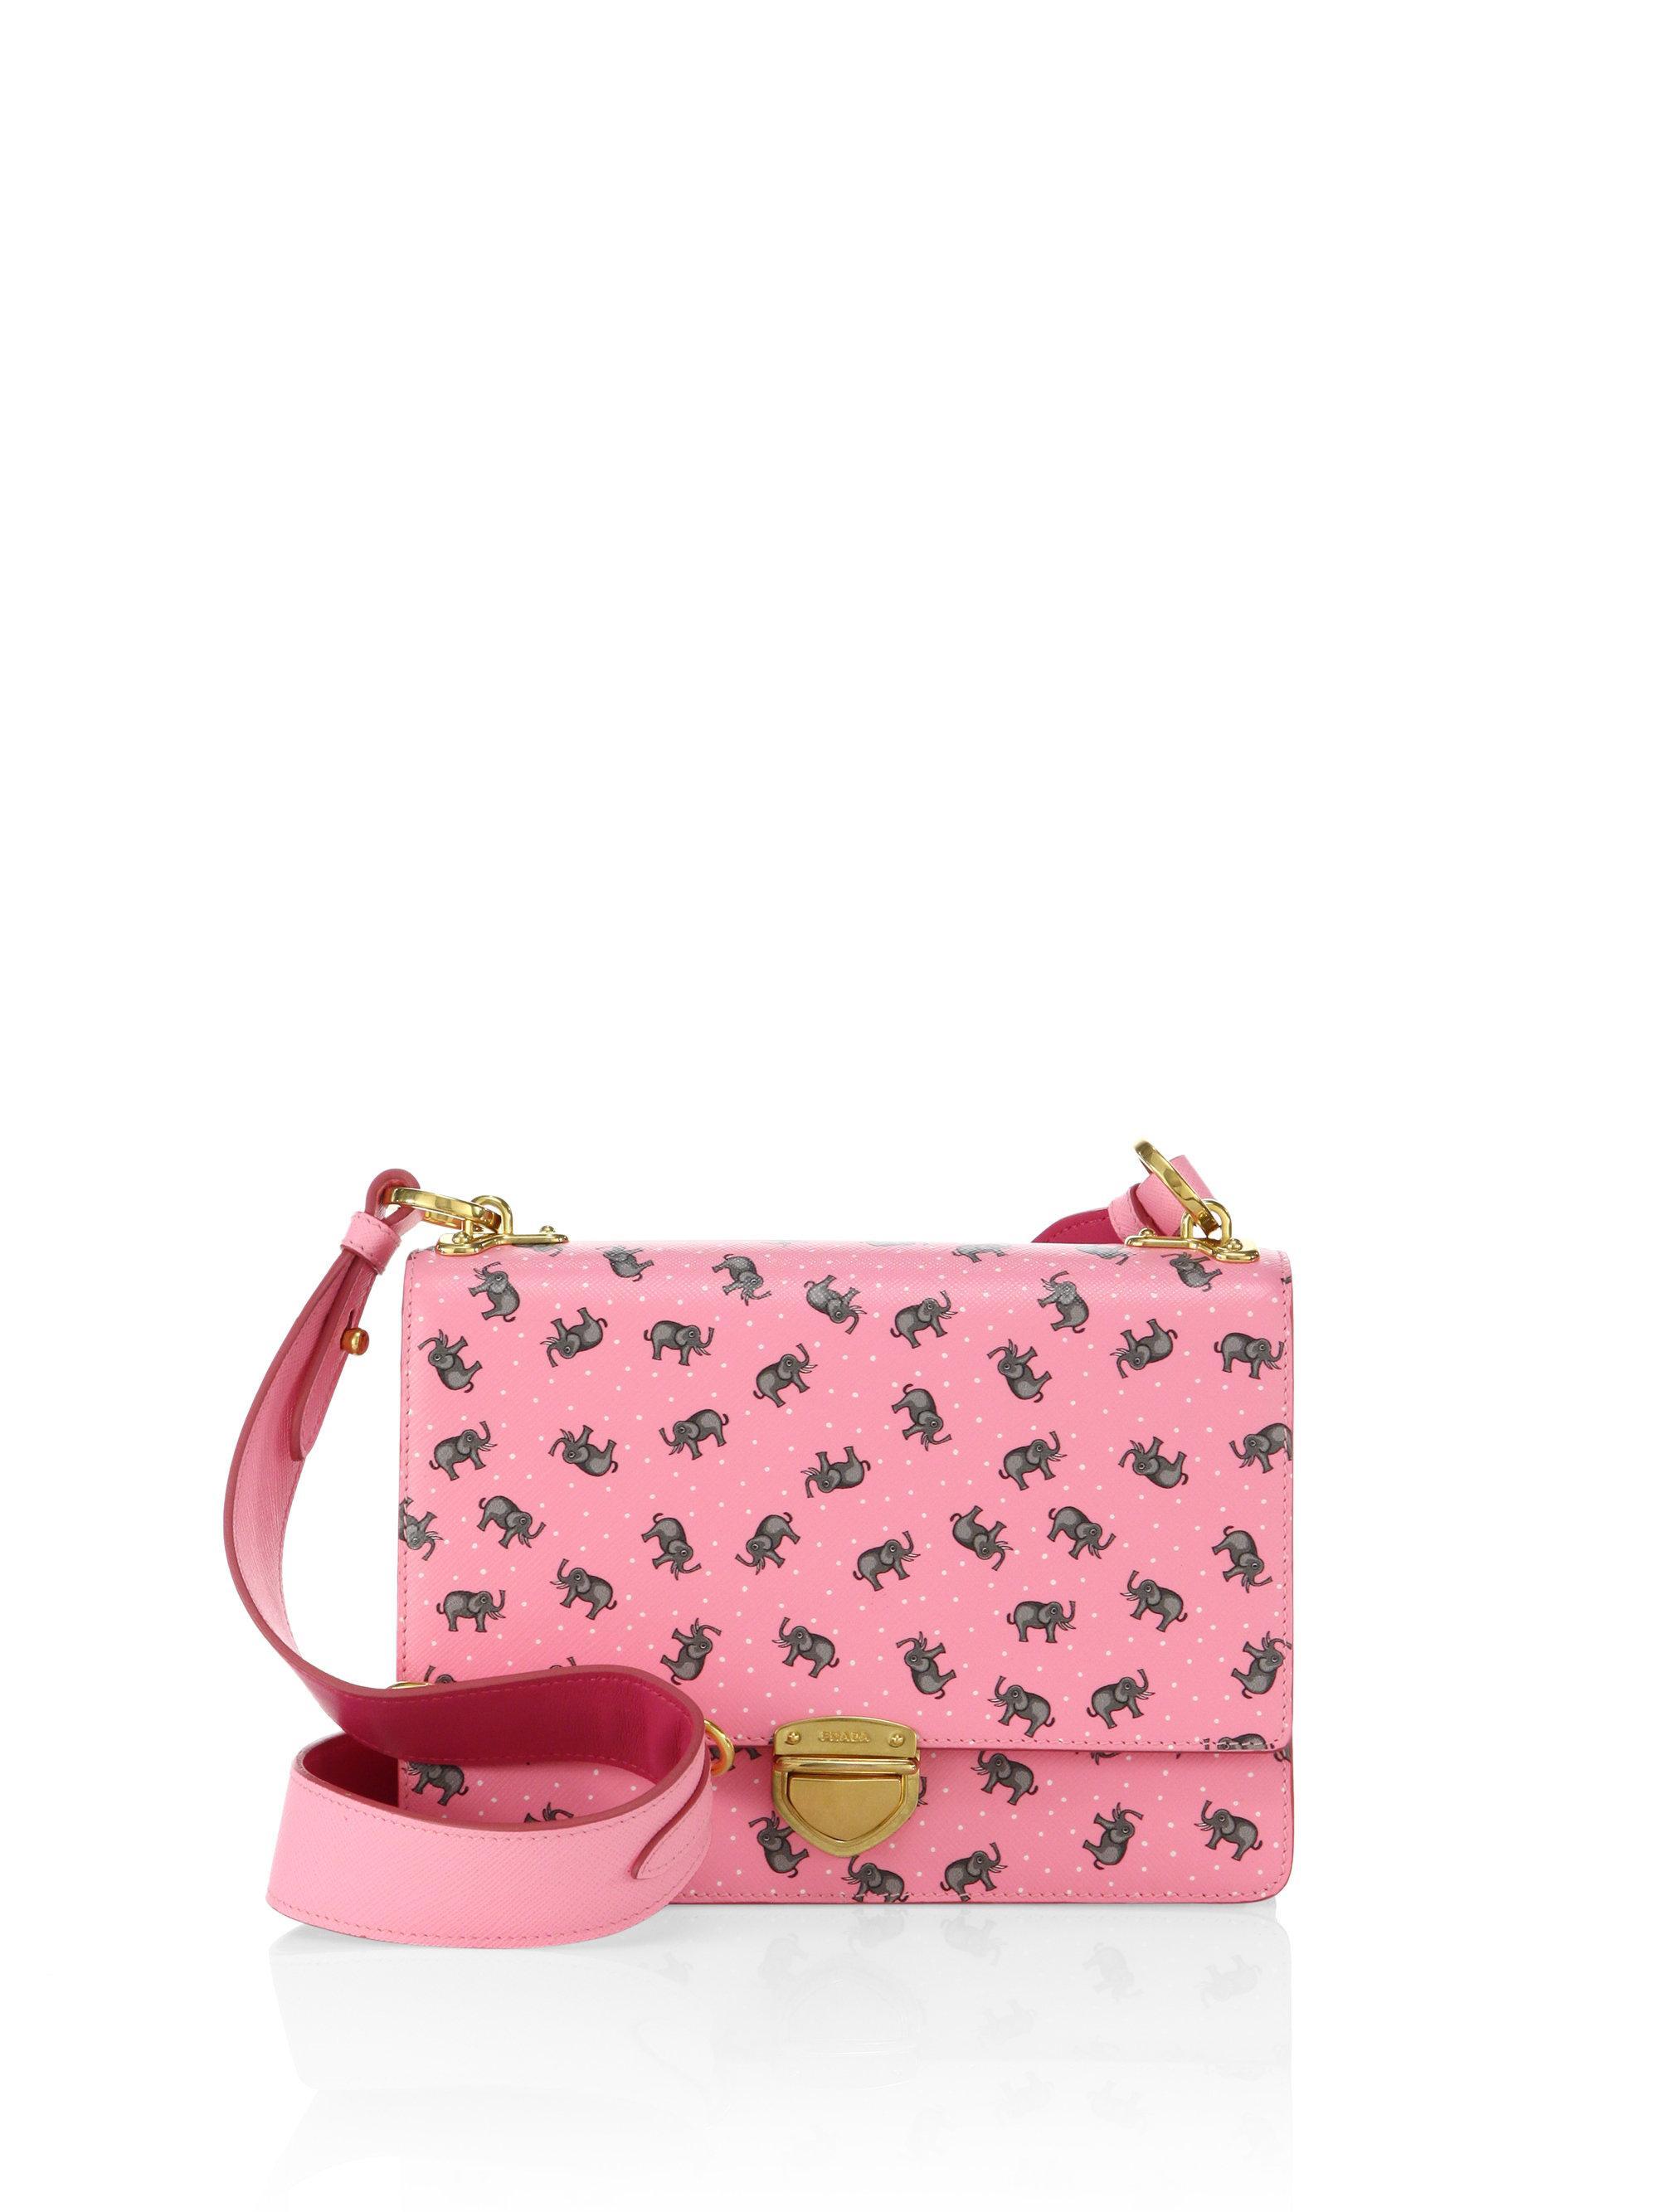 ... italy lyst prada elephant saffiano leather crossbody bag in pink b8c47  62bf3 release date prada backpack tote purse weekender duffle ... 9b6fd192d2